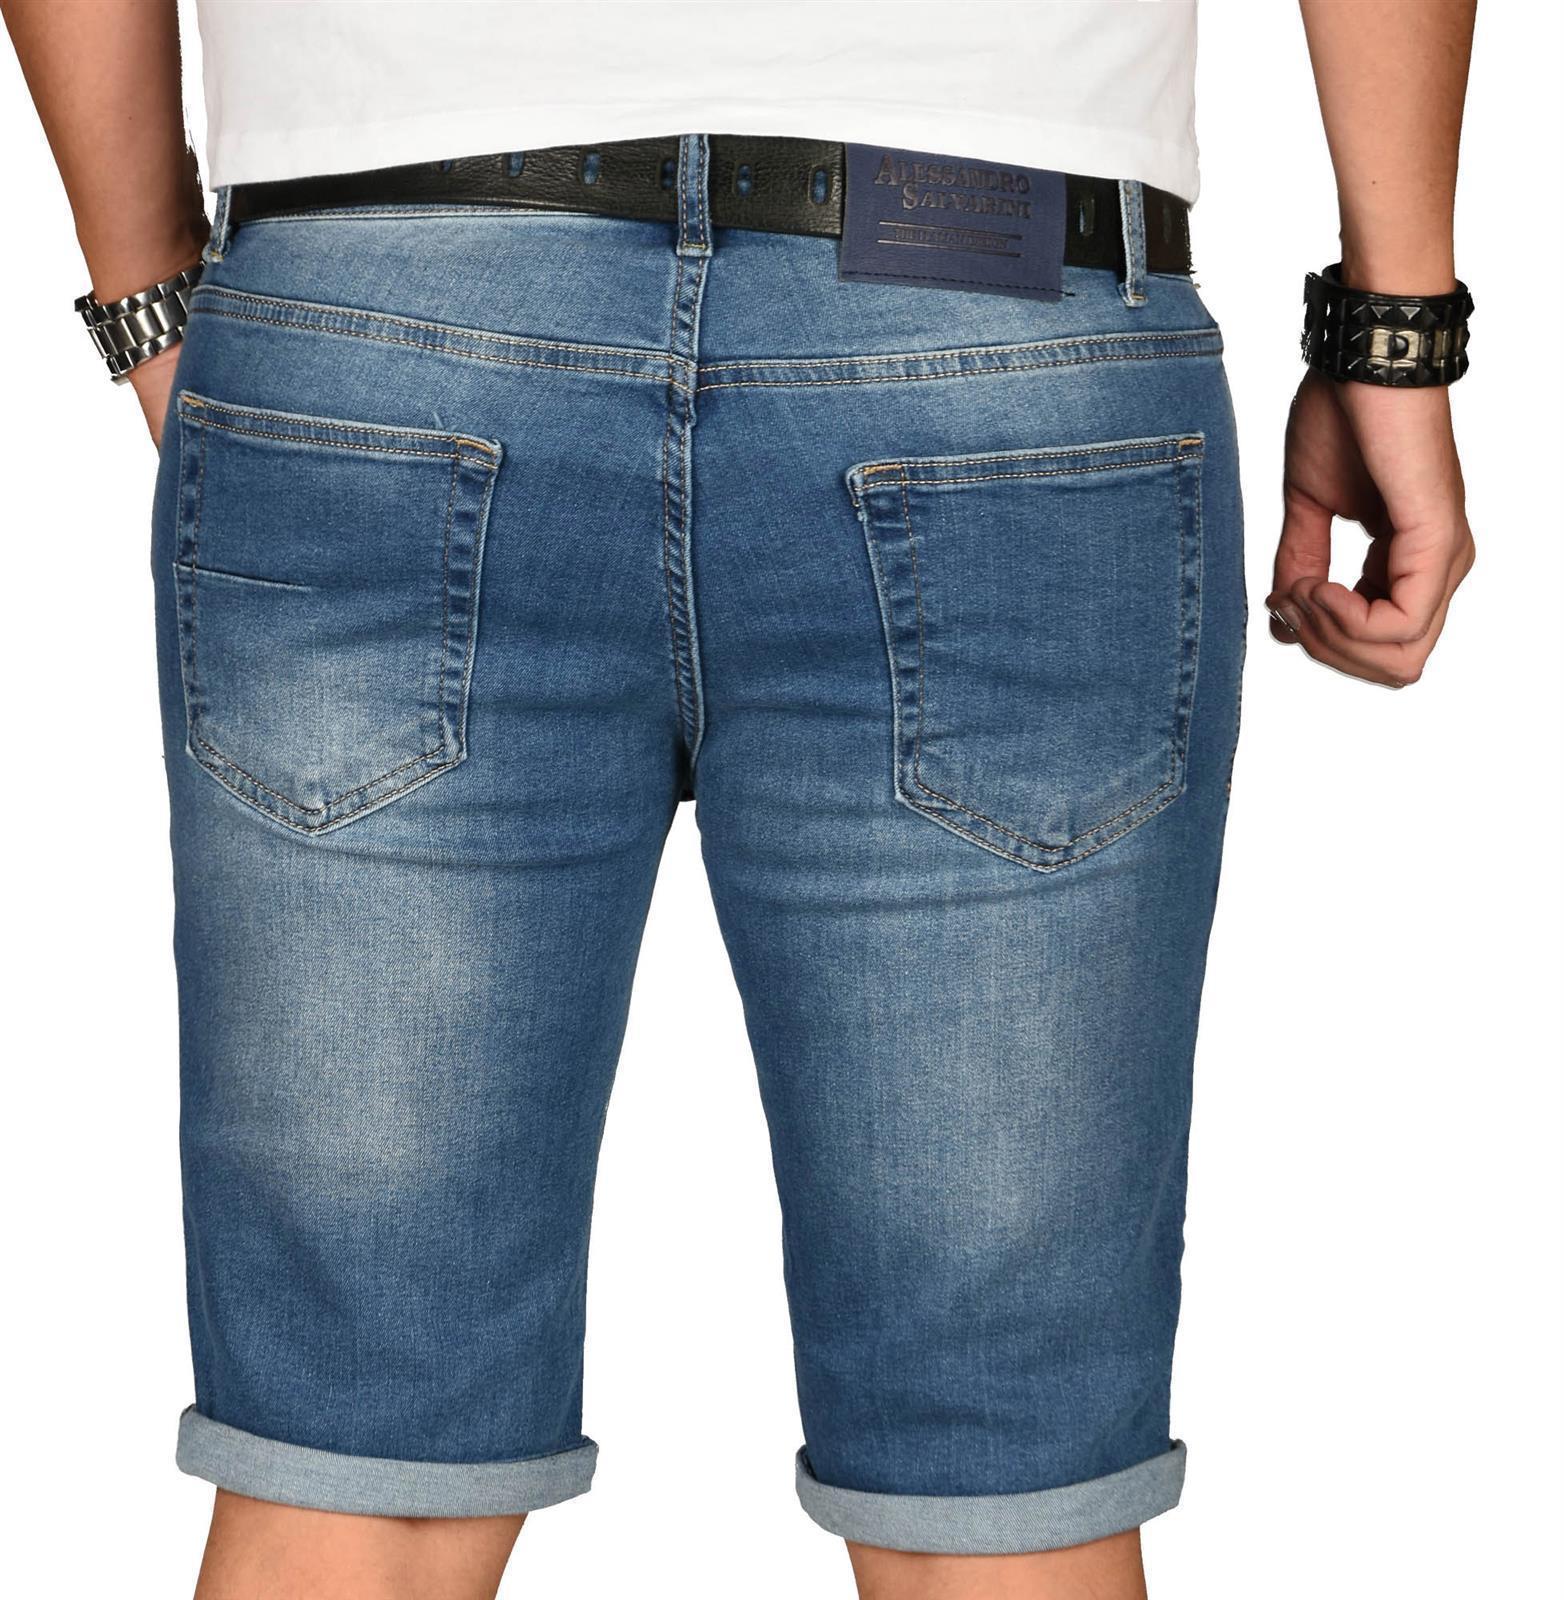 A-Salvarini-Herren-Designer-Jeans-Short-kurze-Hose-Slim-Sommer-Shorts-Washed Indexbild 29